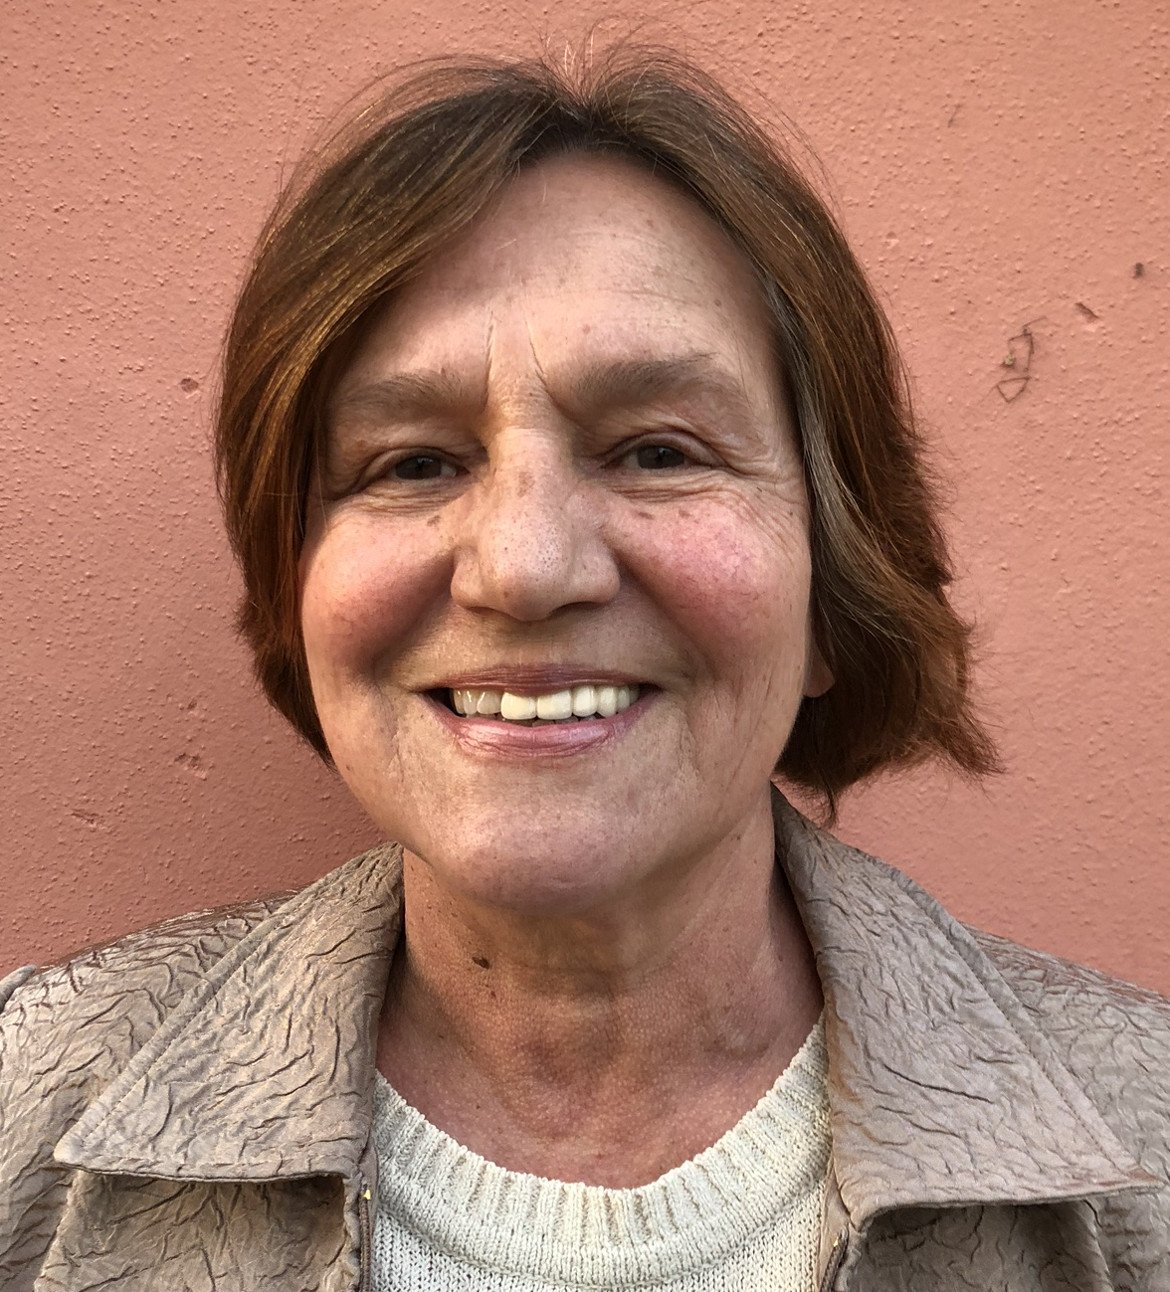 Renate Ellmenreich